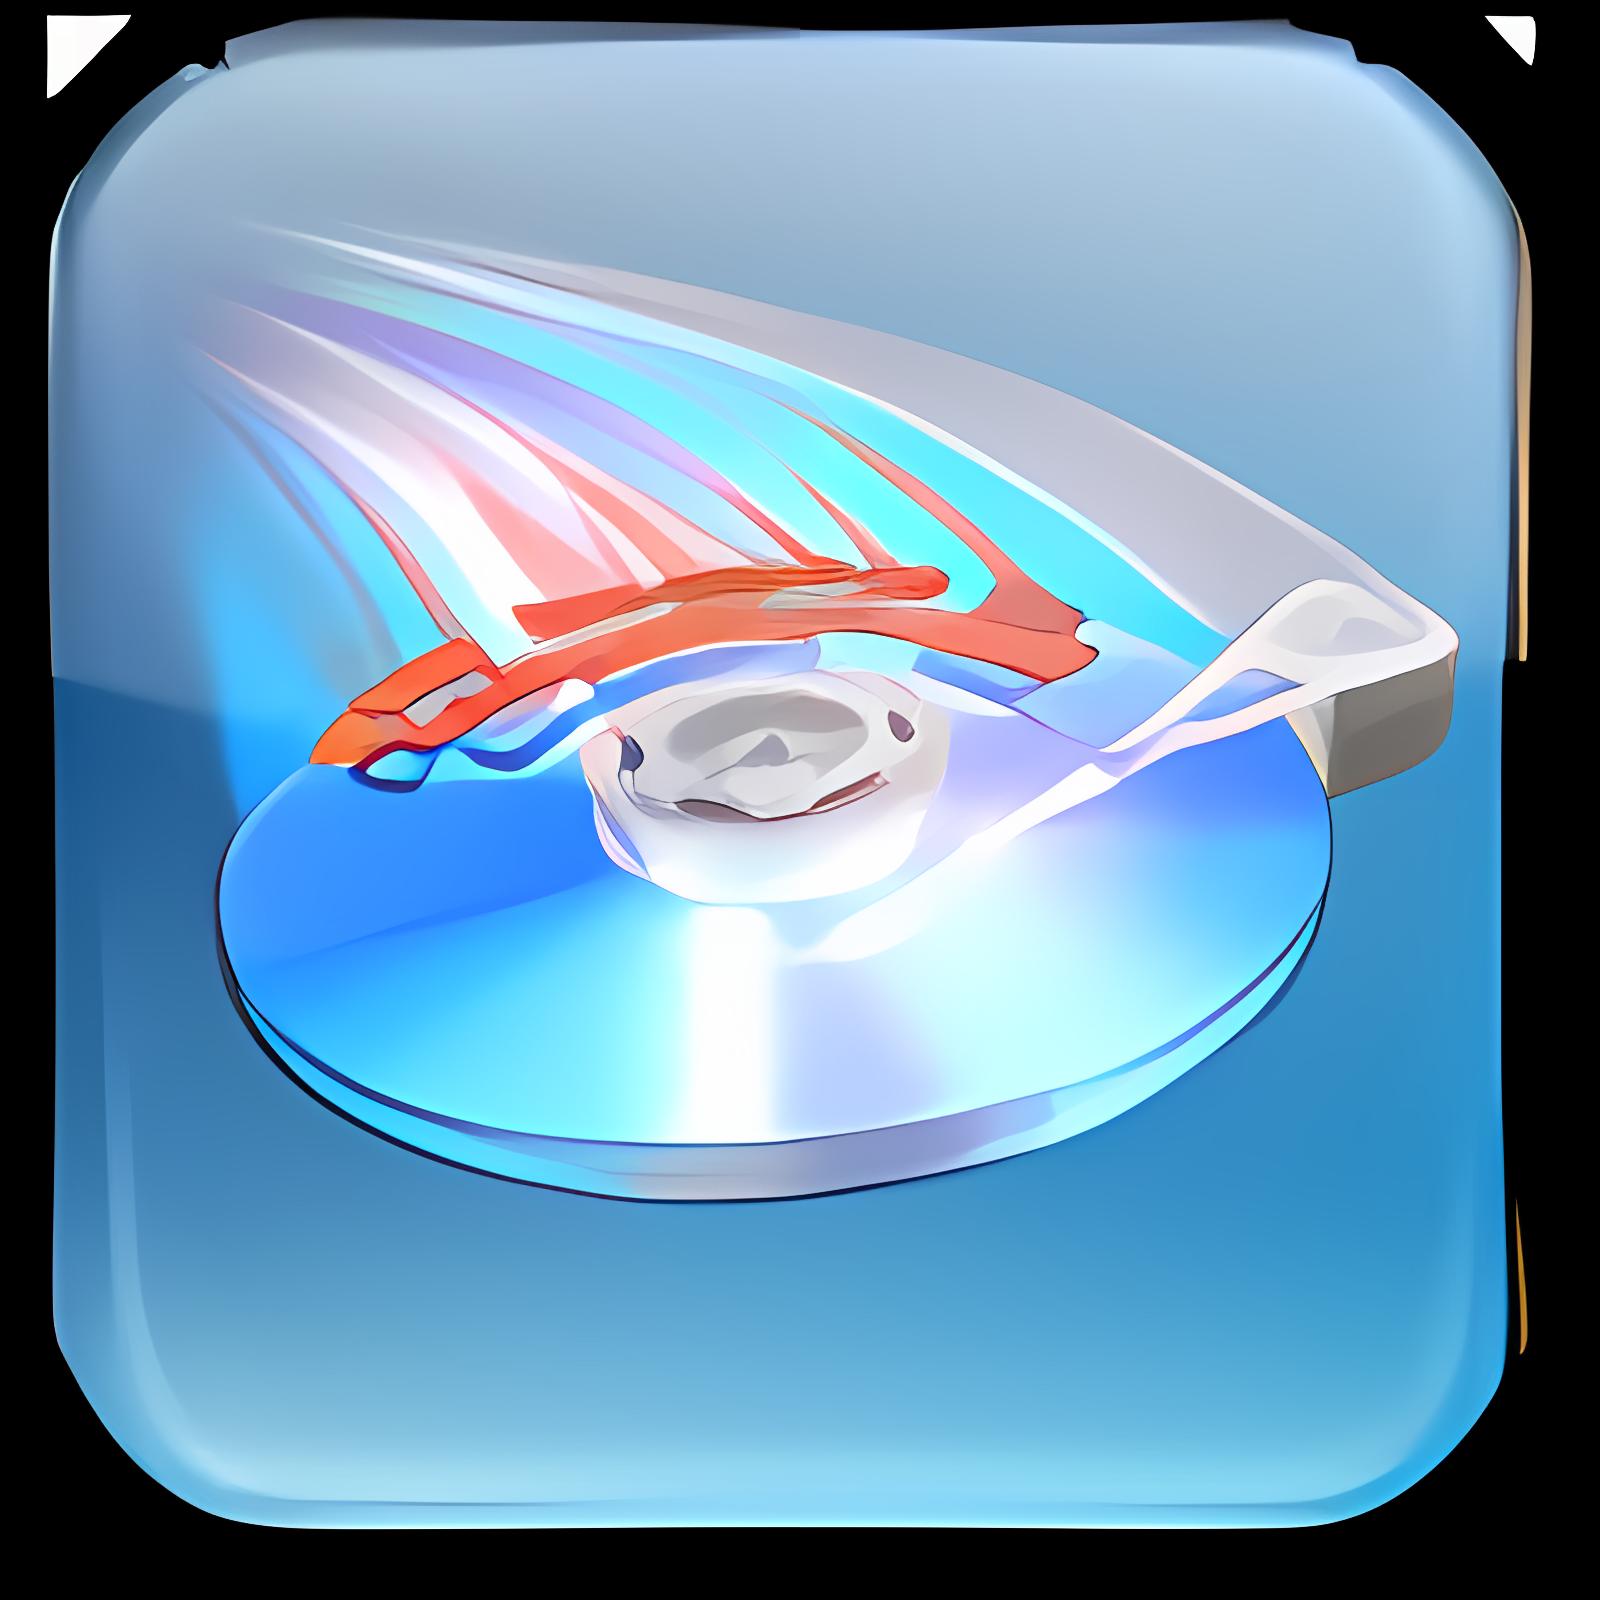 Diskeeper Home 2009 13.0.844